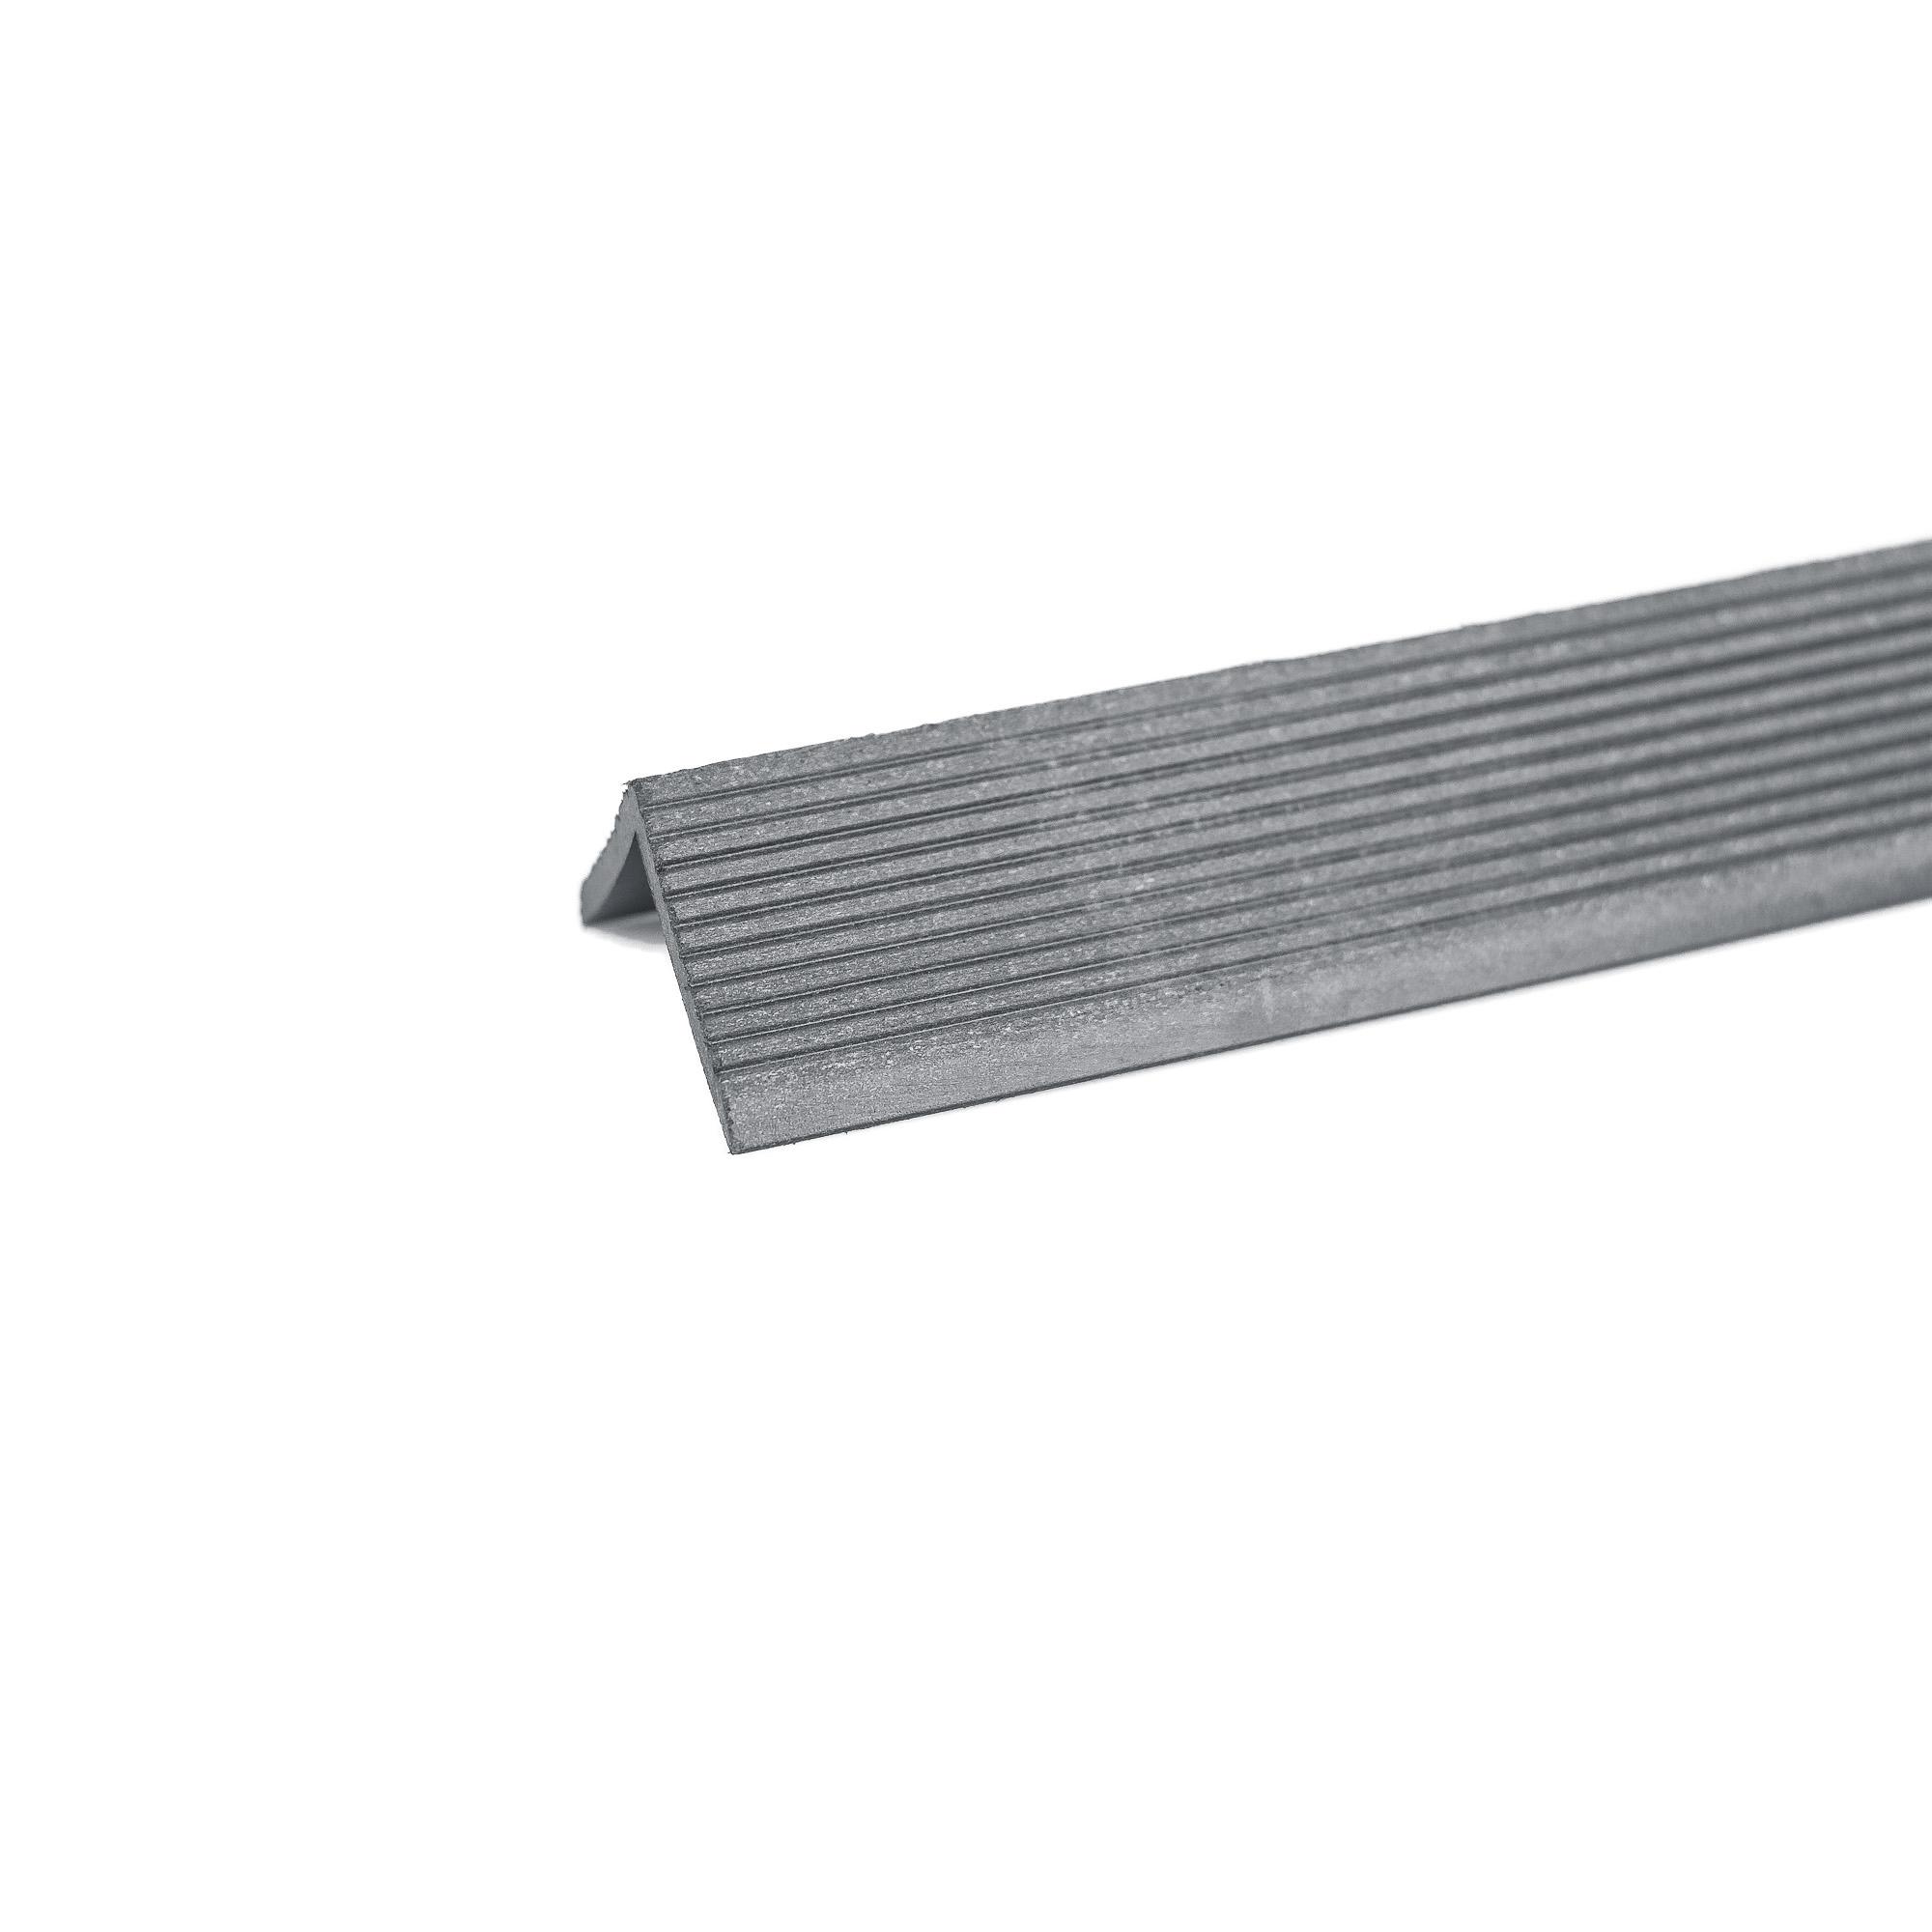 Profil colt WPC Bencomp, gri, 50 x 50 x 2000 mm imagine MatHaus